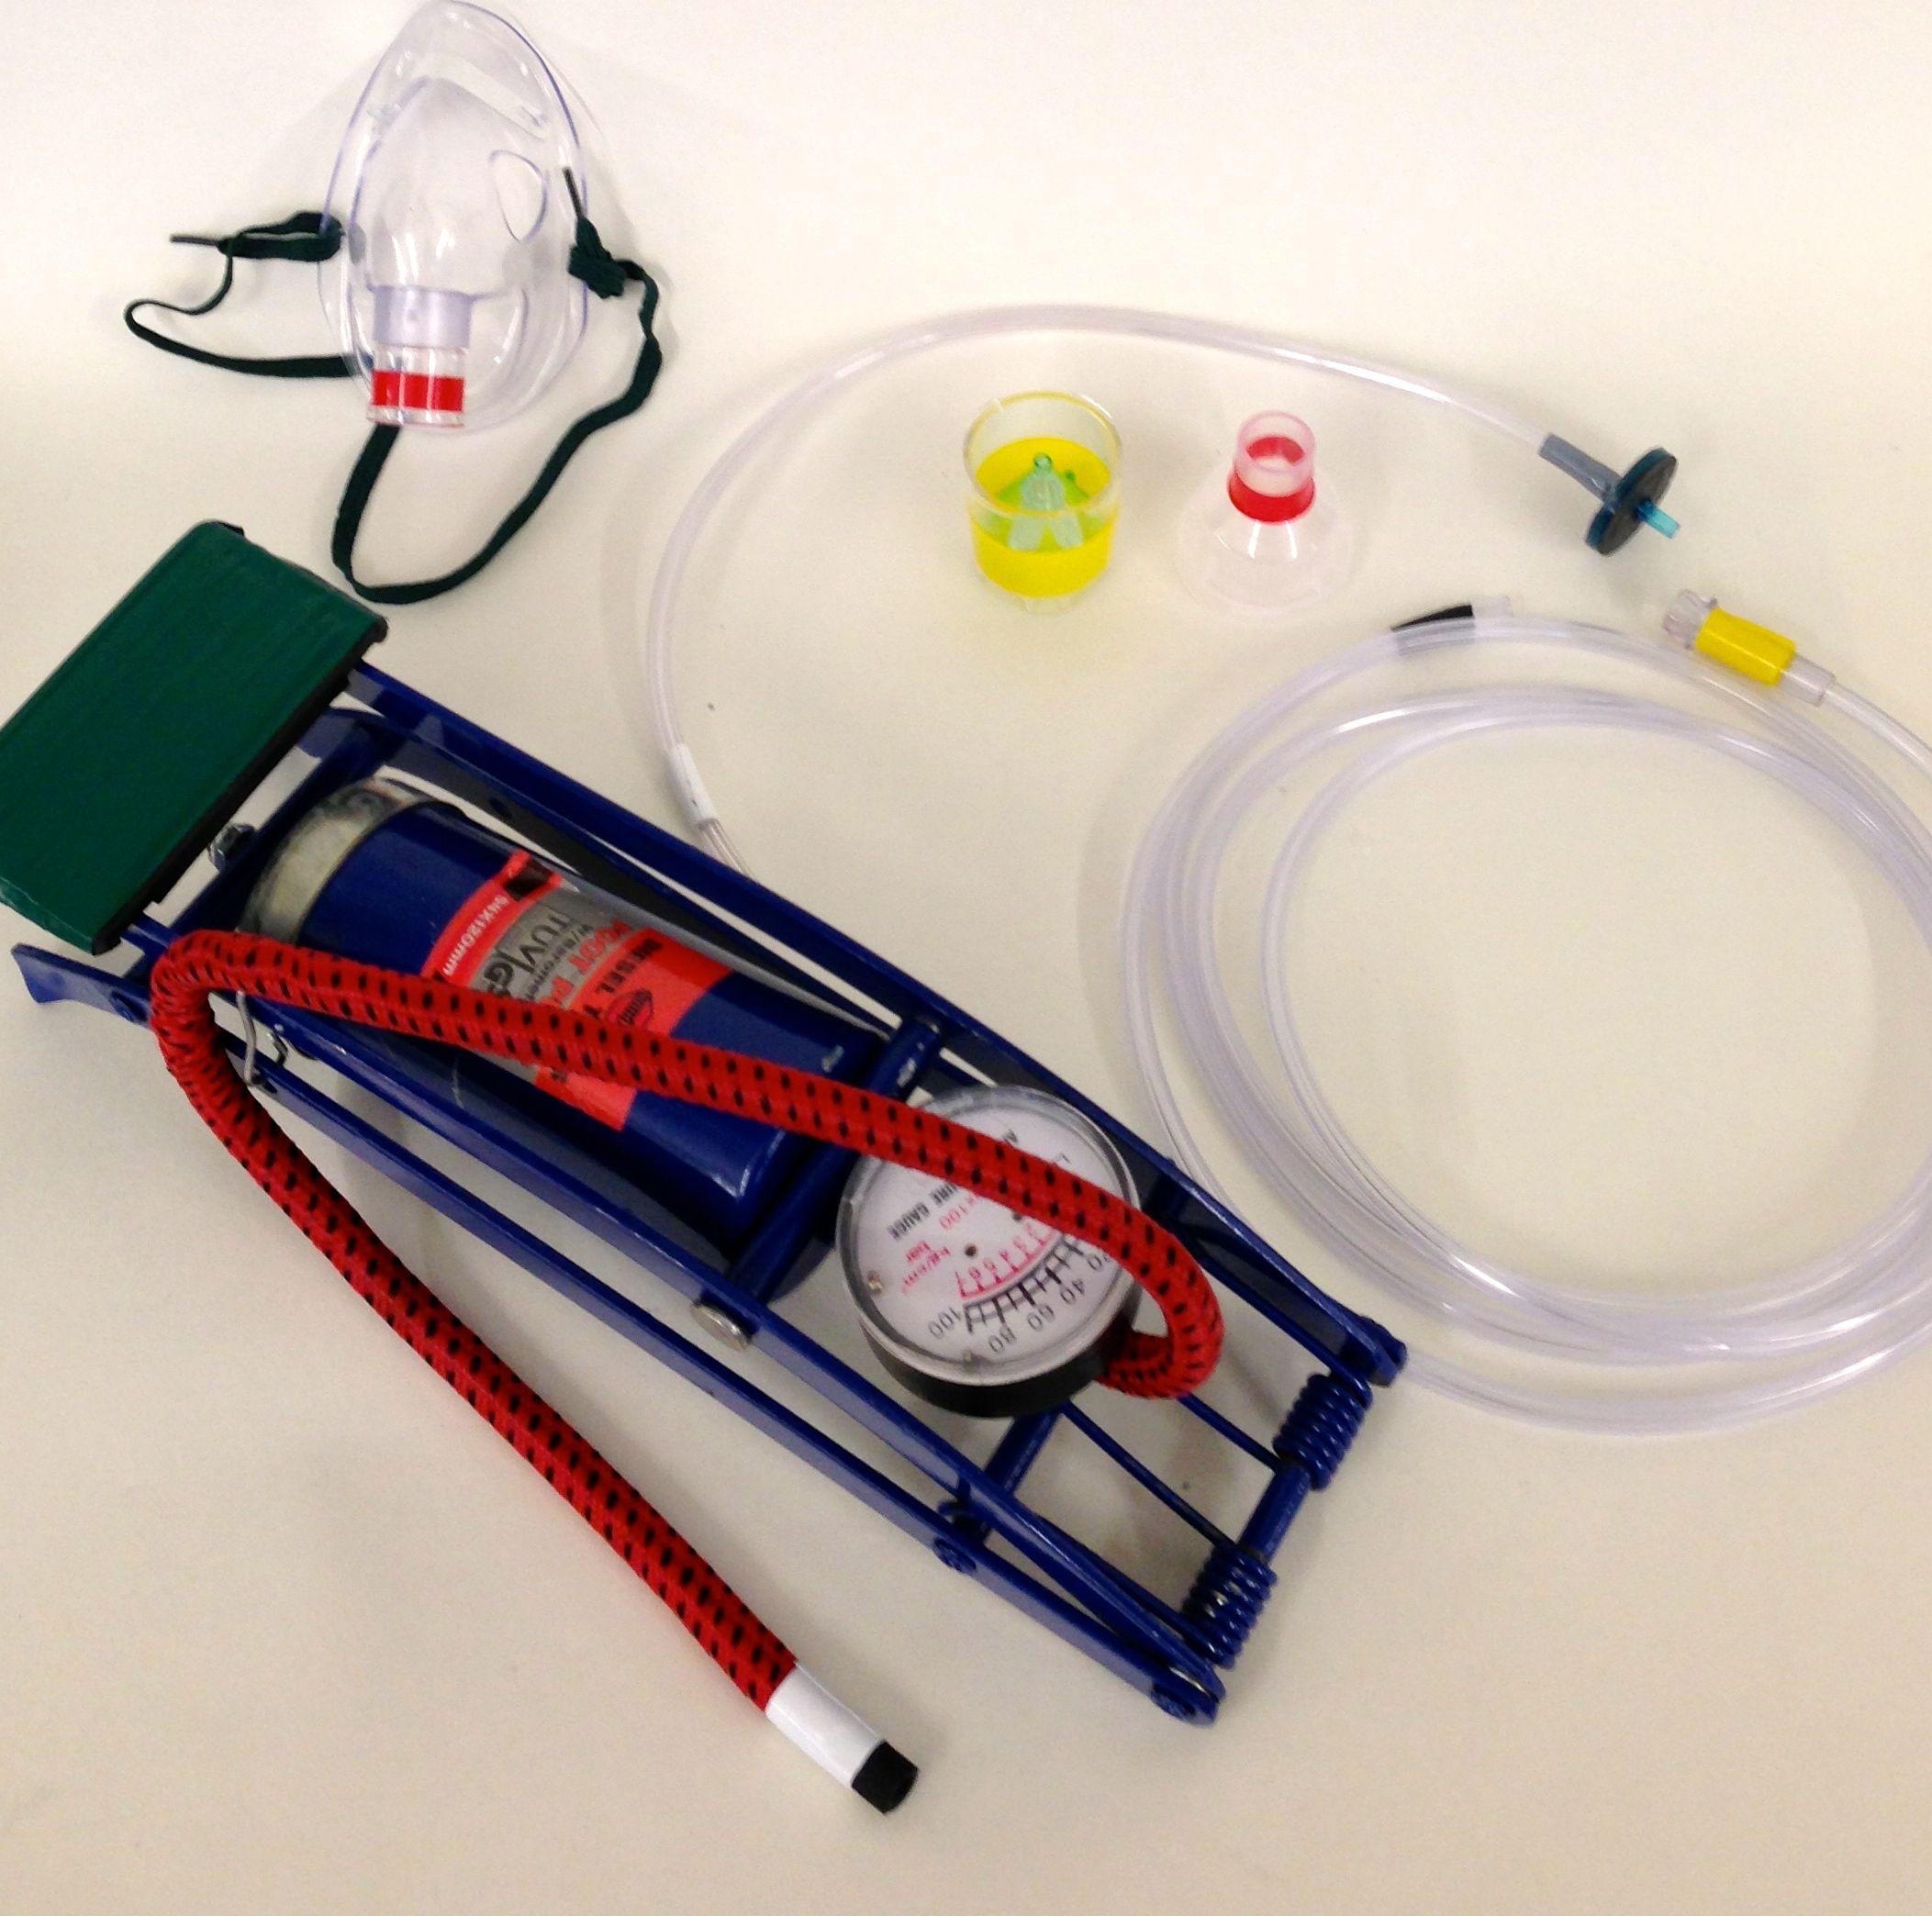 DIY MEDIKit Nebulizer Nebulizer, Respiratory therapy humor